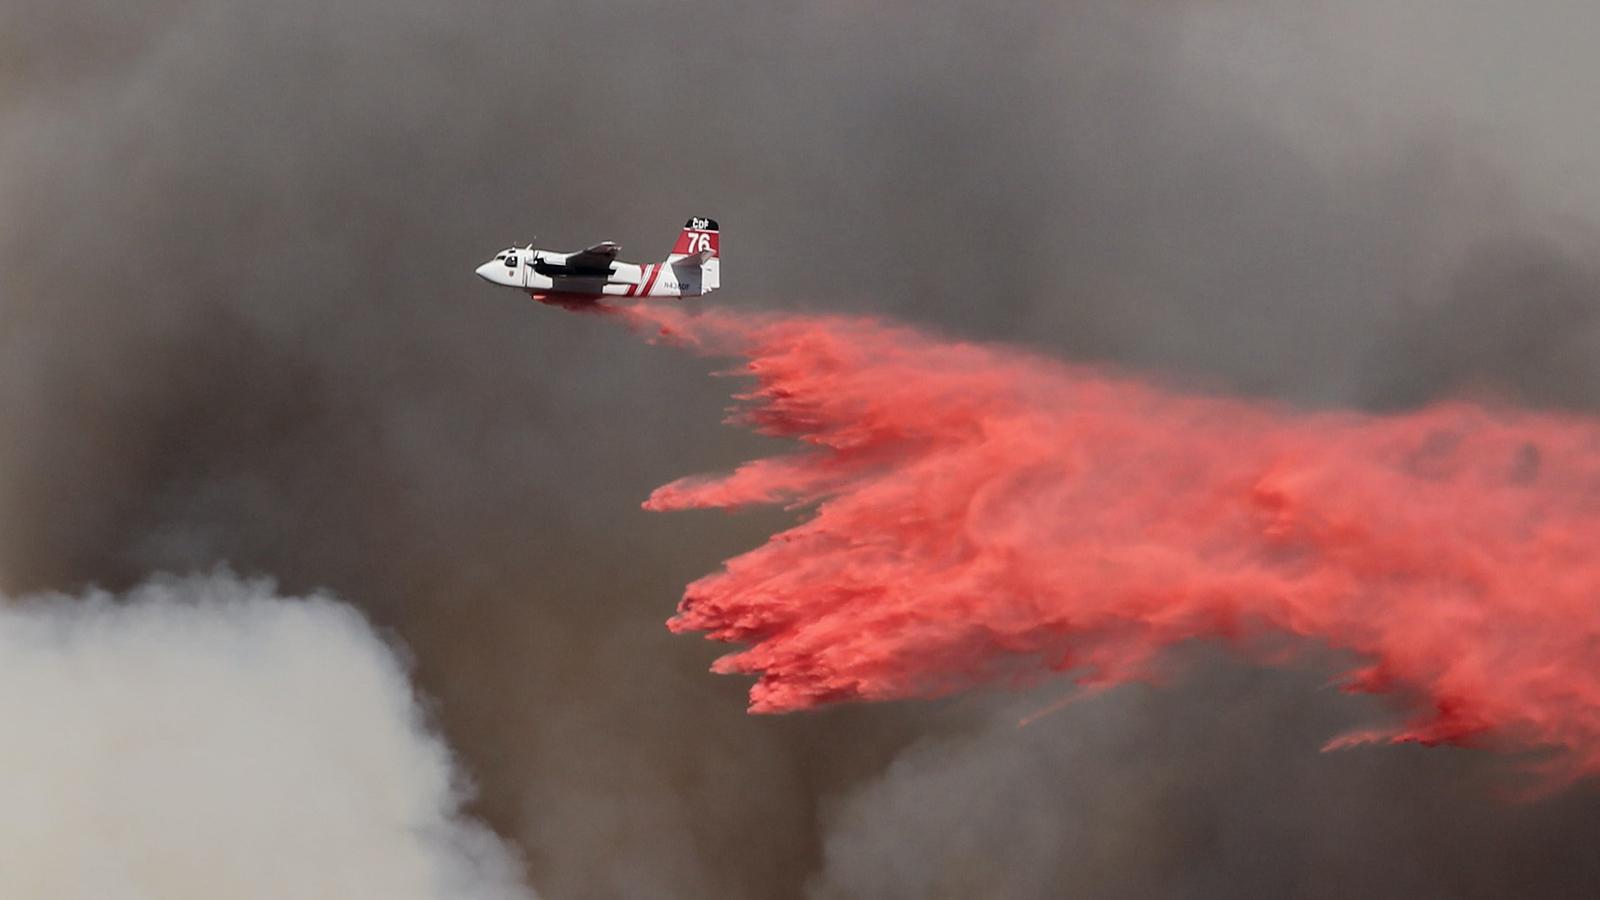 Air Tanker Drops Retardant on Wildfire